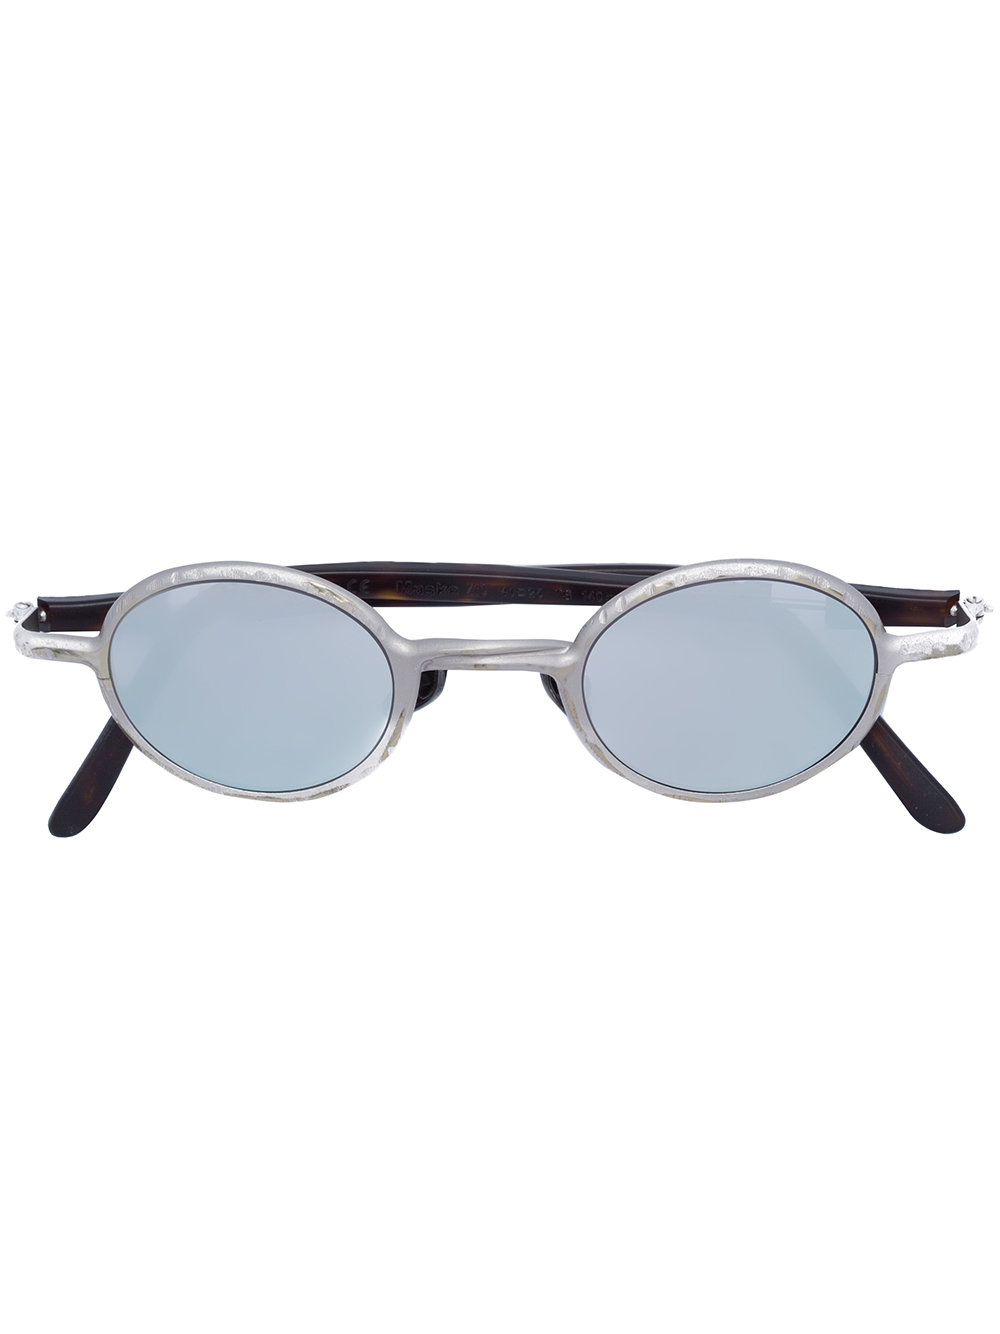 Kuboraum Ambush illesteva ivory baxter narrow sunglasses narrow rectangular sunglasses small sunglasses trend 90s sunglasses where to buy tiny sunglasses tiny 90s sunglasses narrow frame sunglasses tiny sunglasses trend